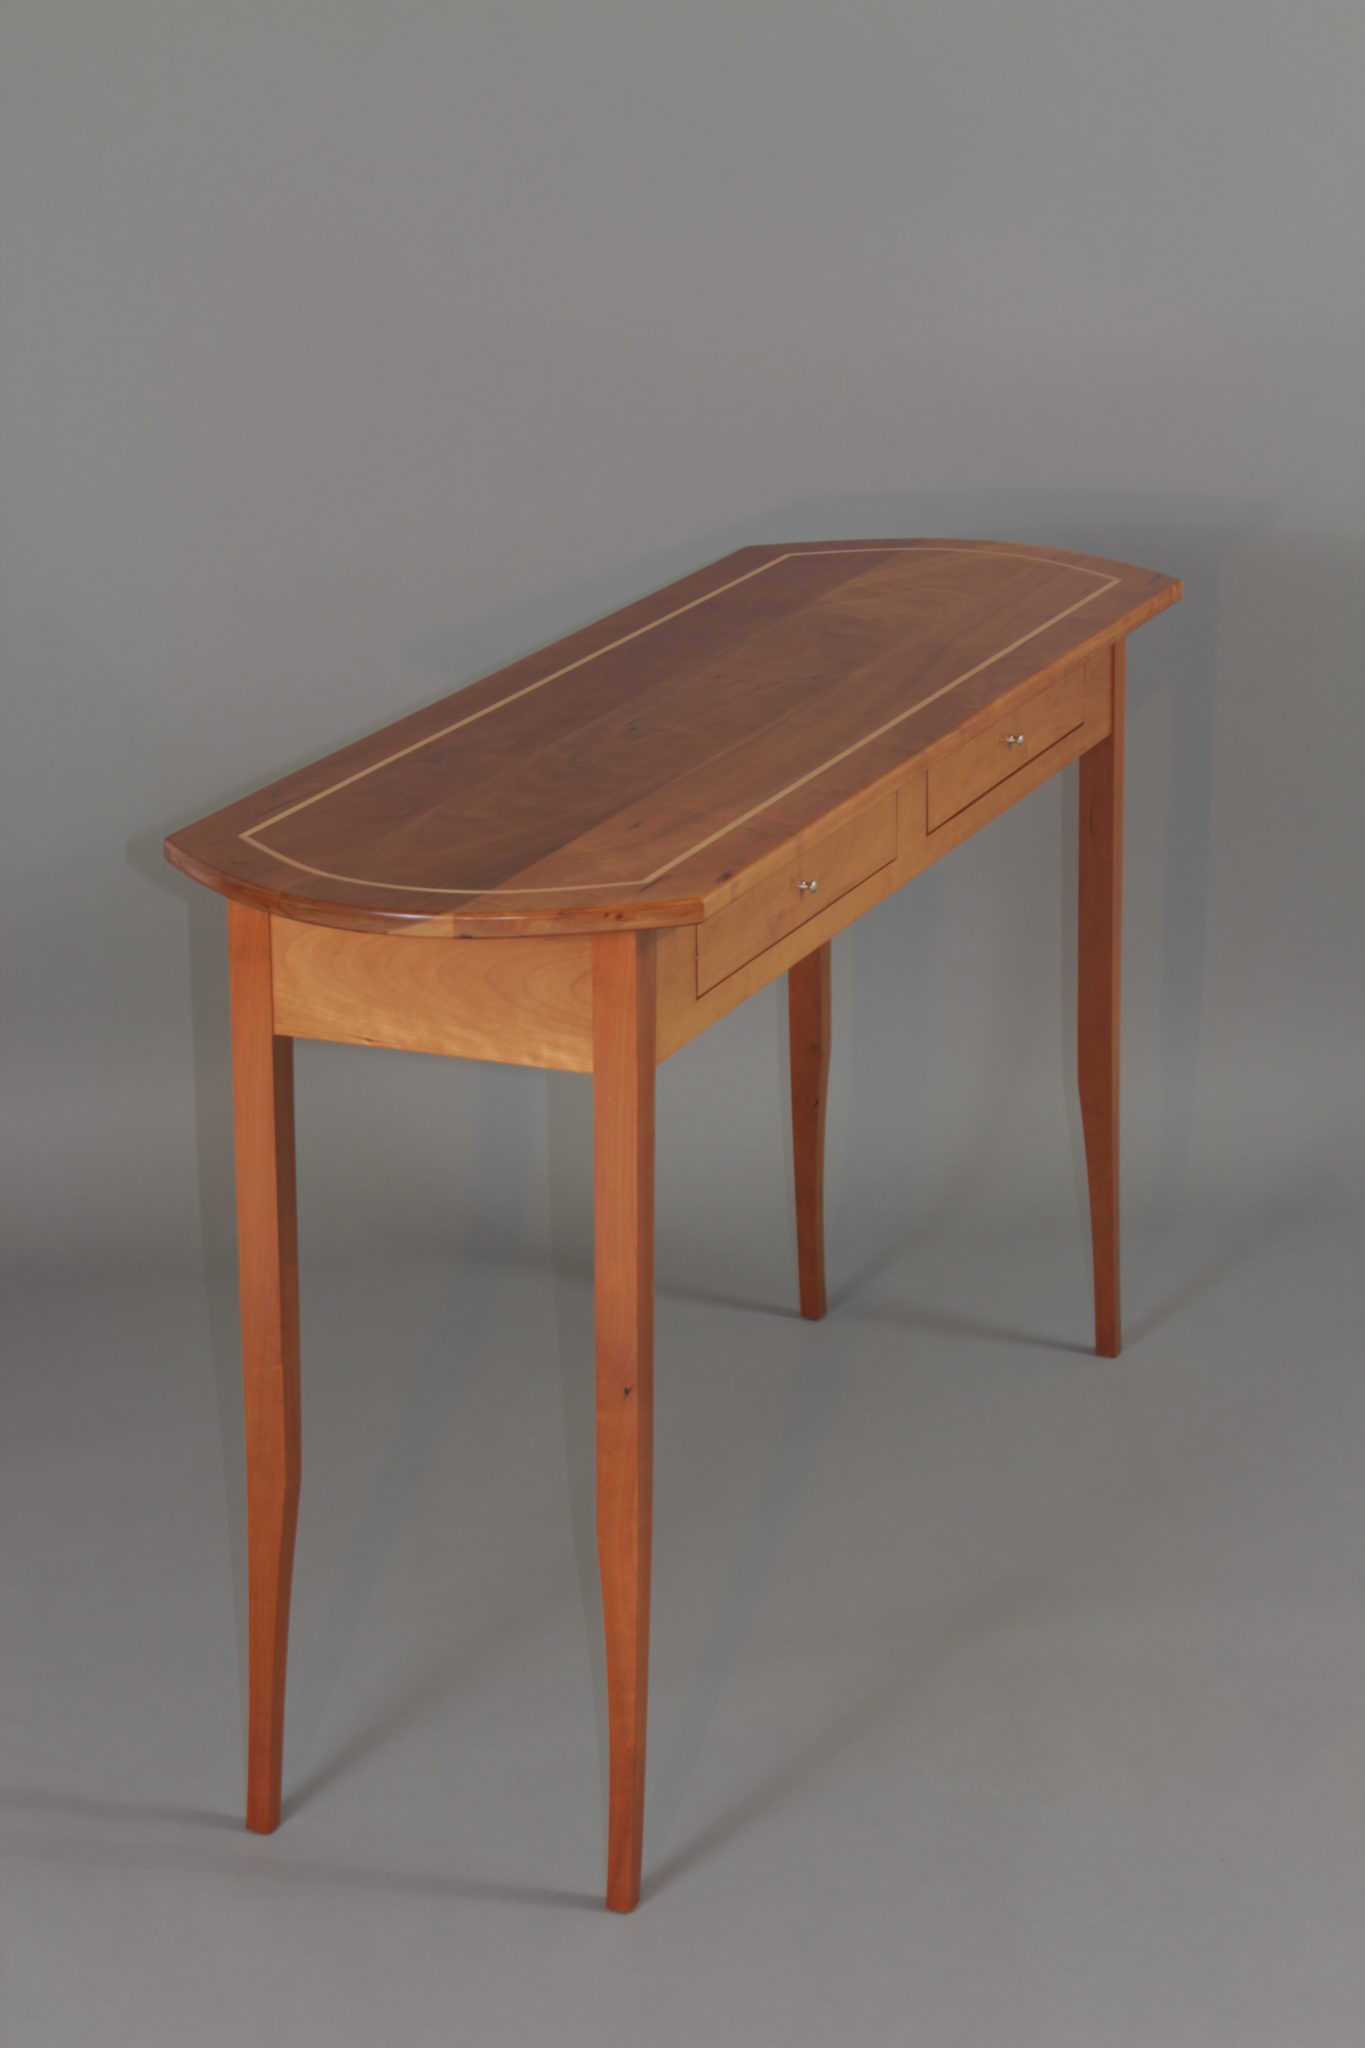 Hall table-furniture maker maine-Fine furniture Camden Maine-custom furniture